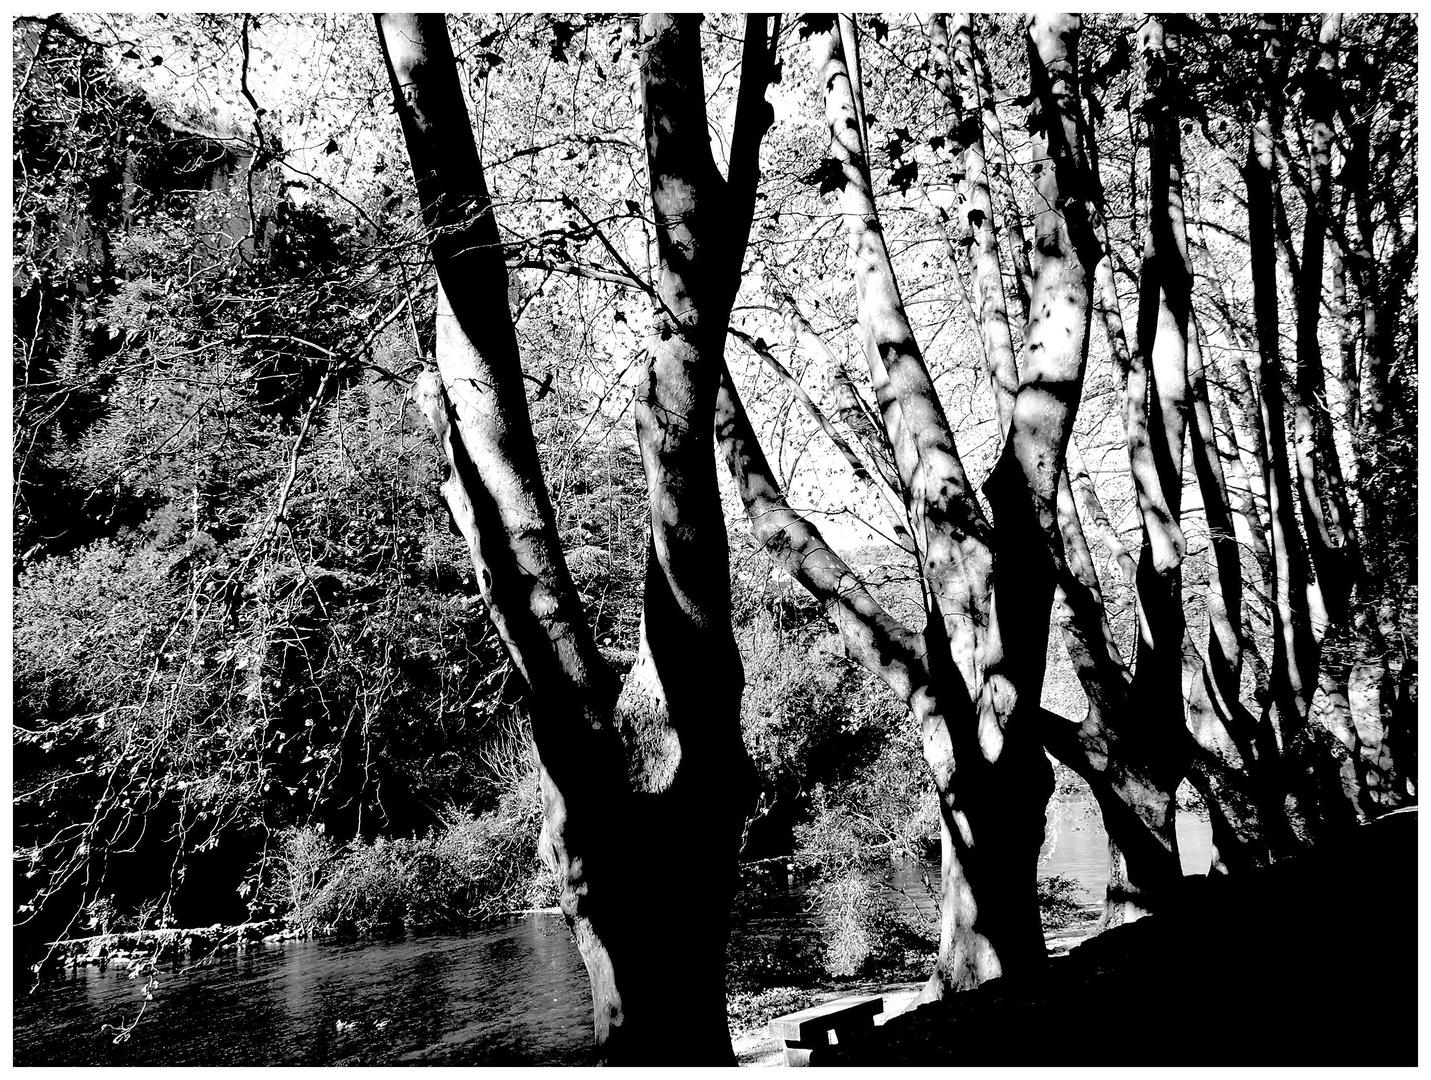 arbres en clair obscur